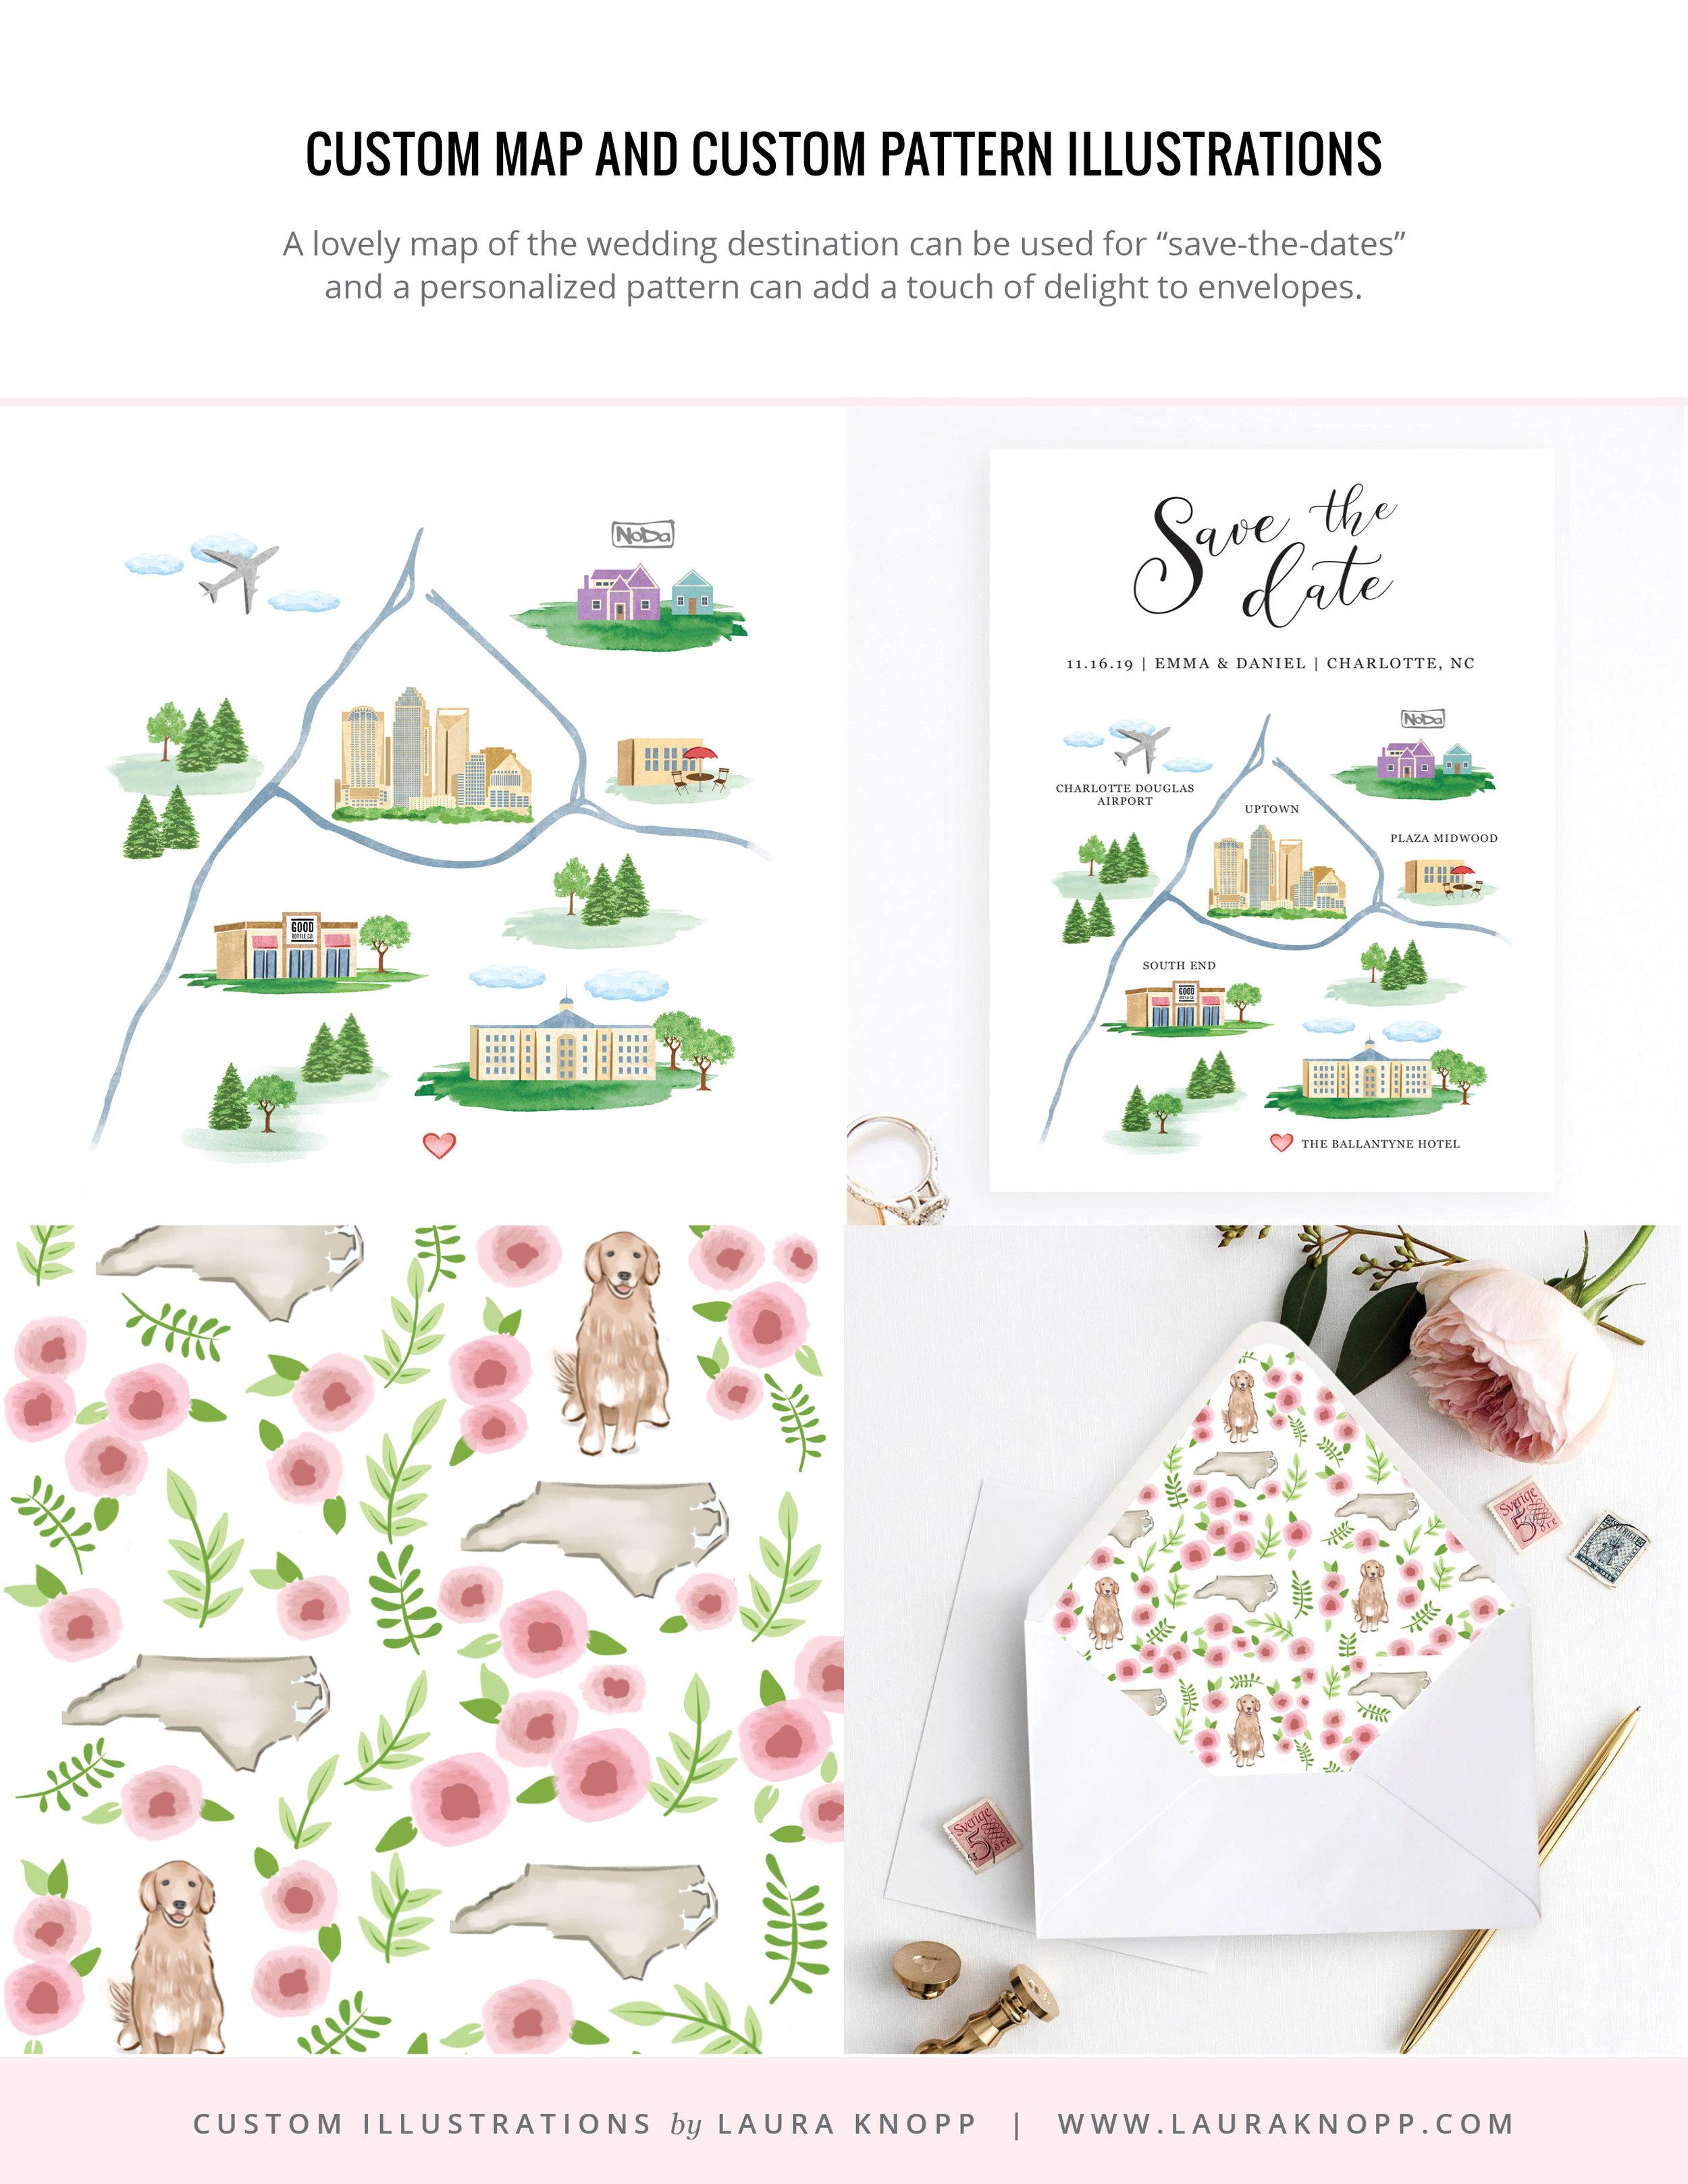 Custom-Wedding-Illustration-Guide5.jpg